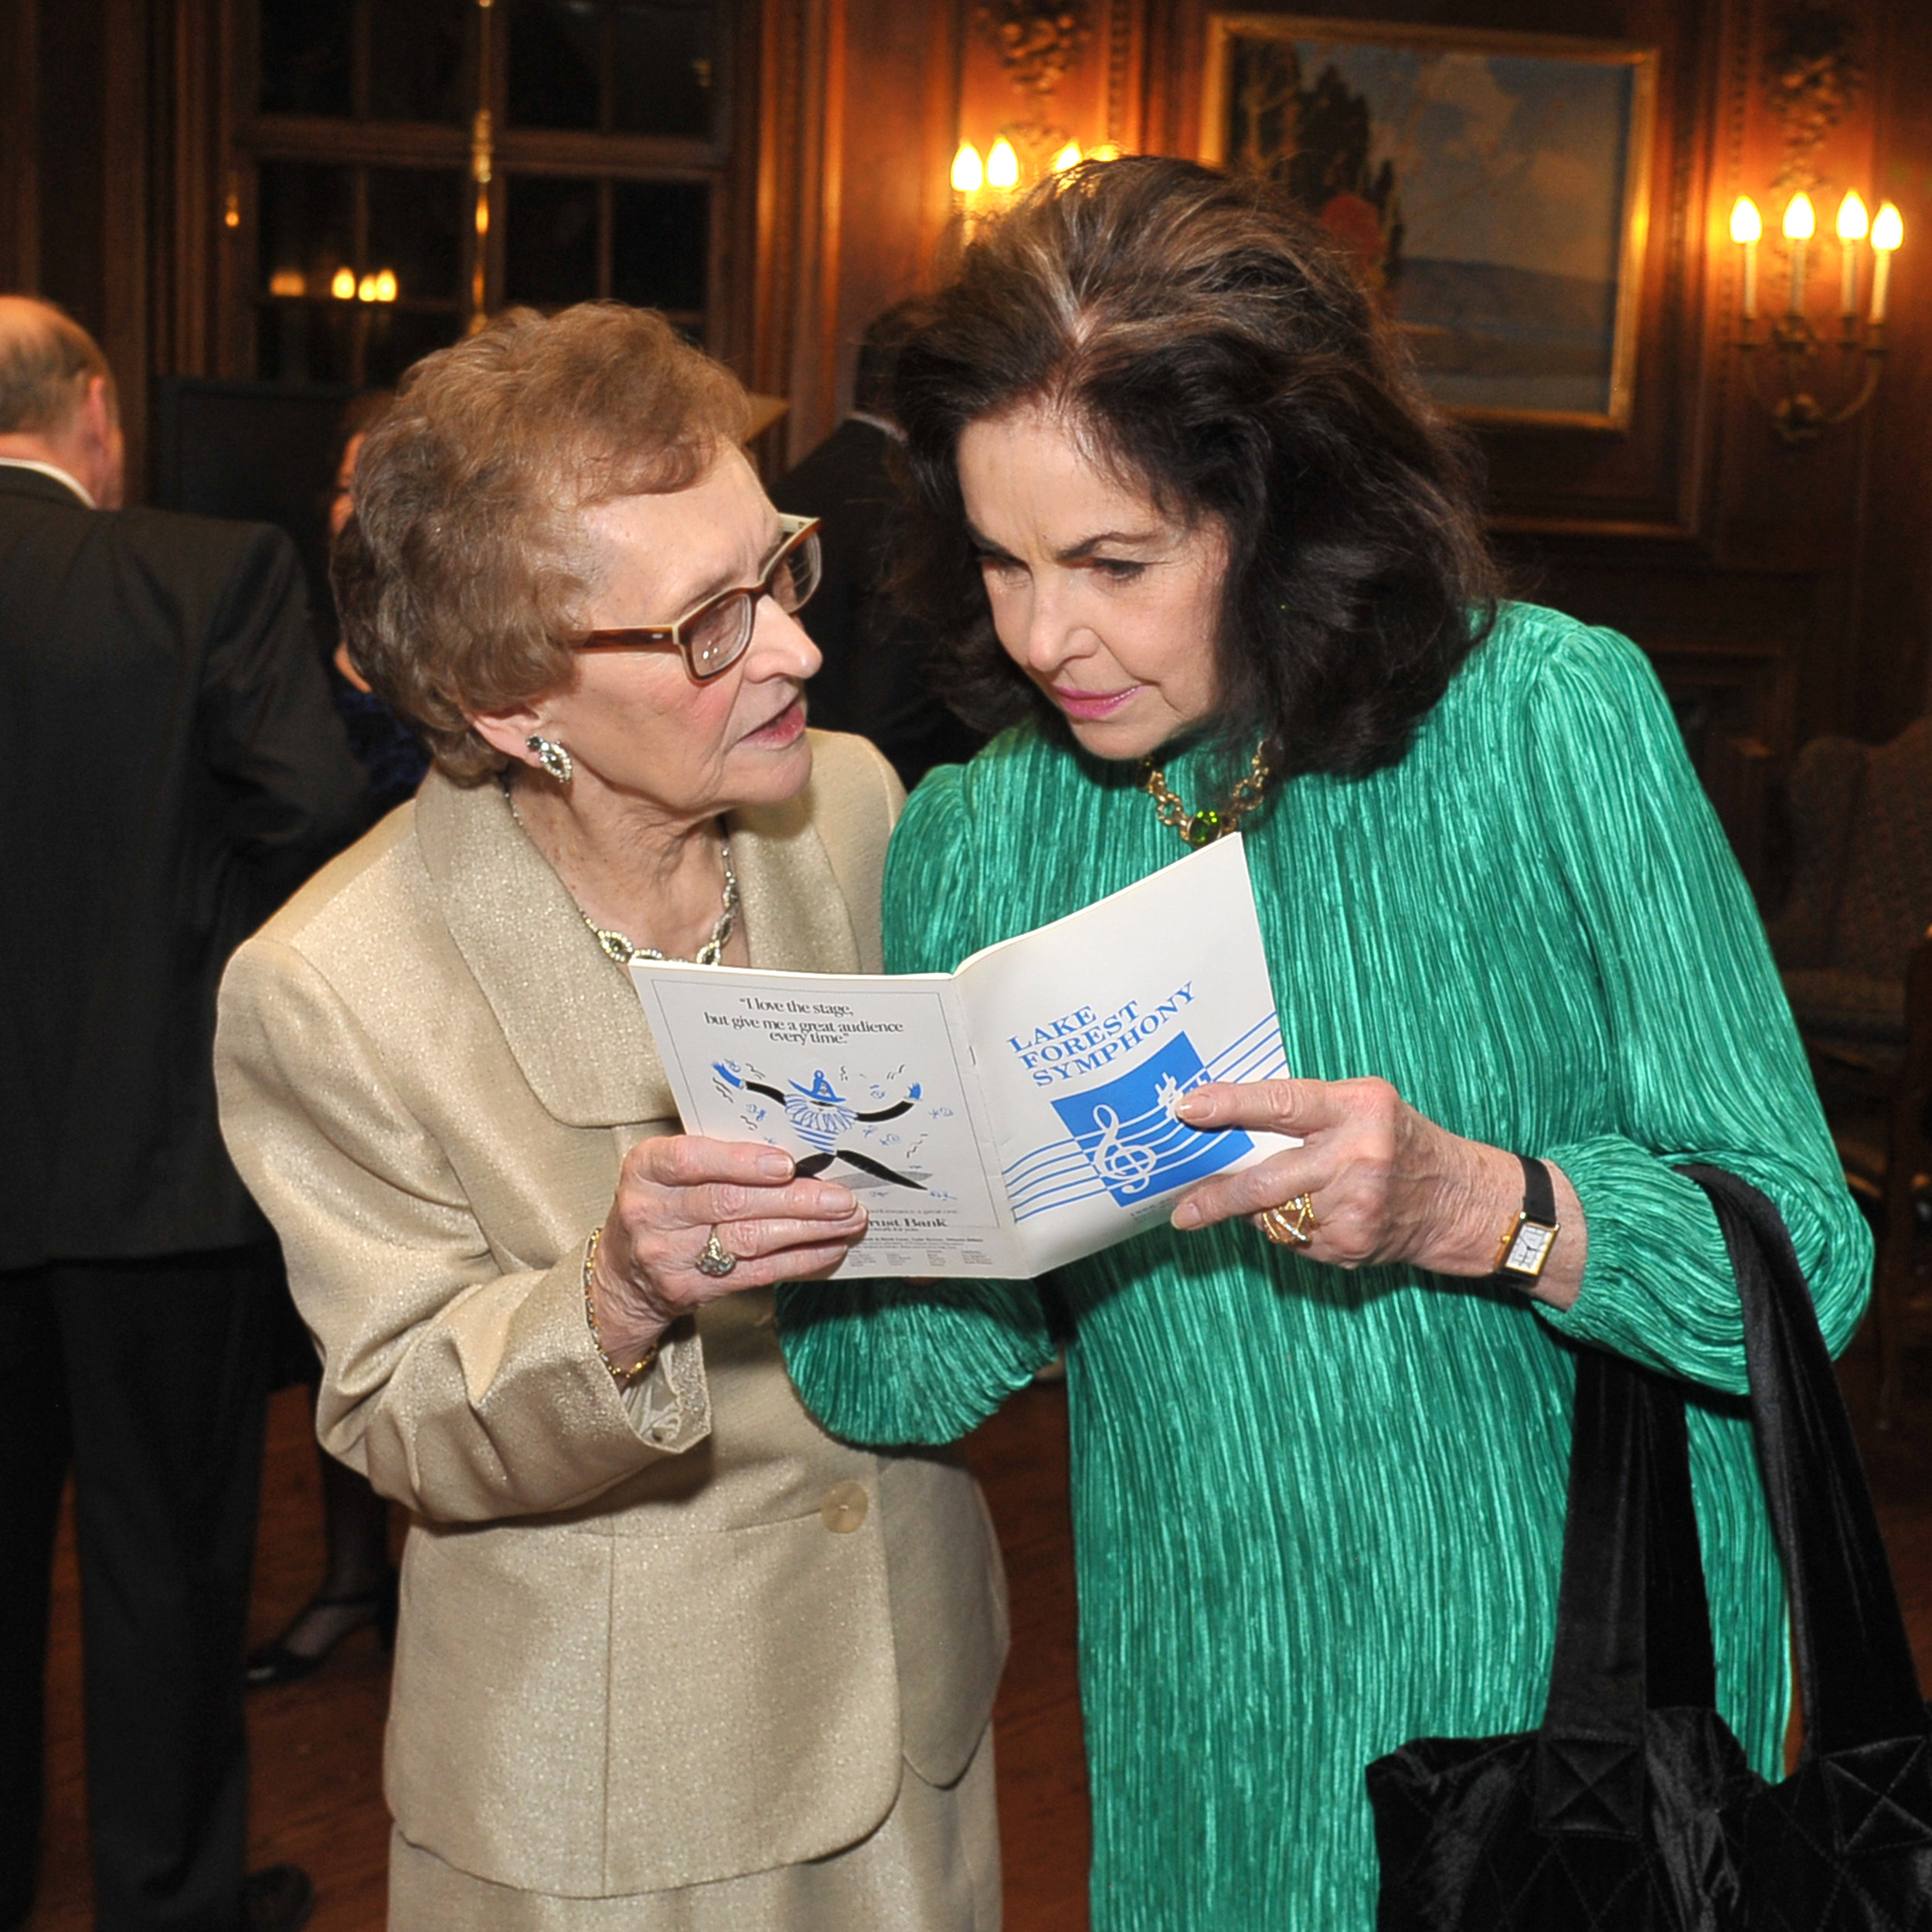 Betty Benton and Caroline Douglas reminisce on LFS programs from the past